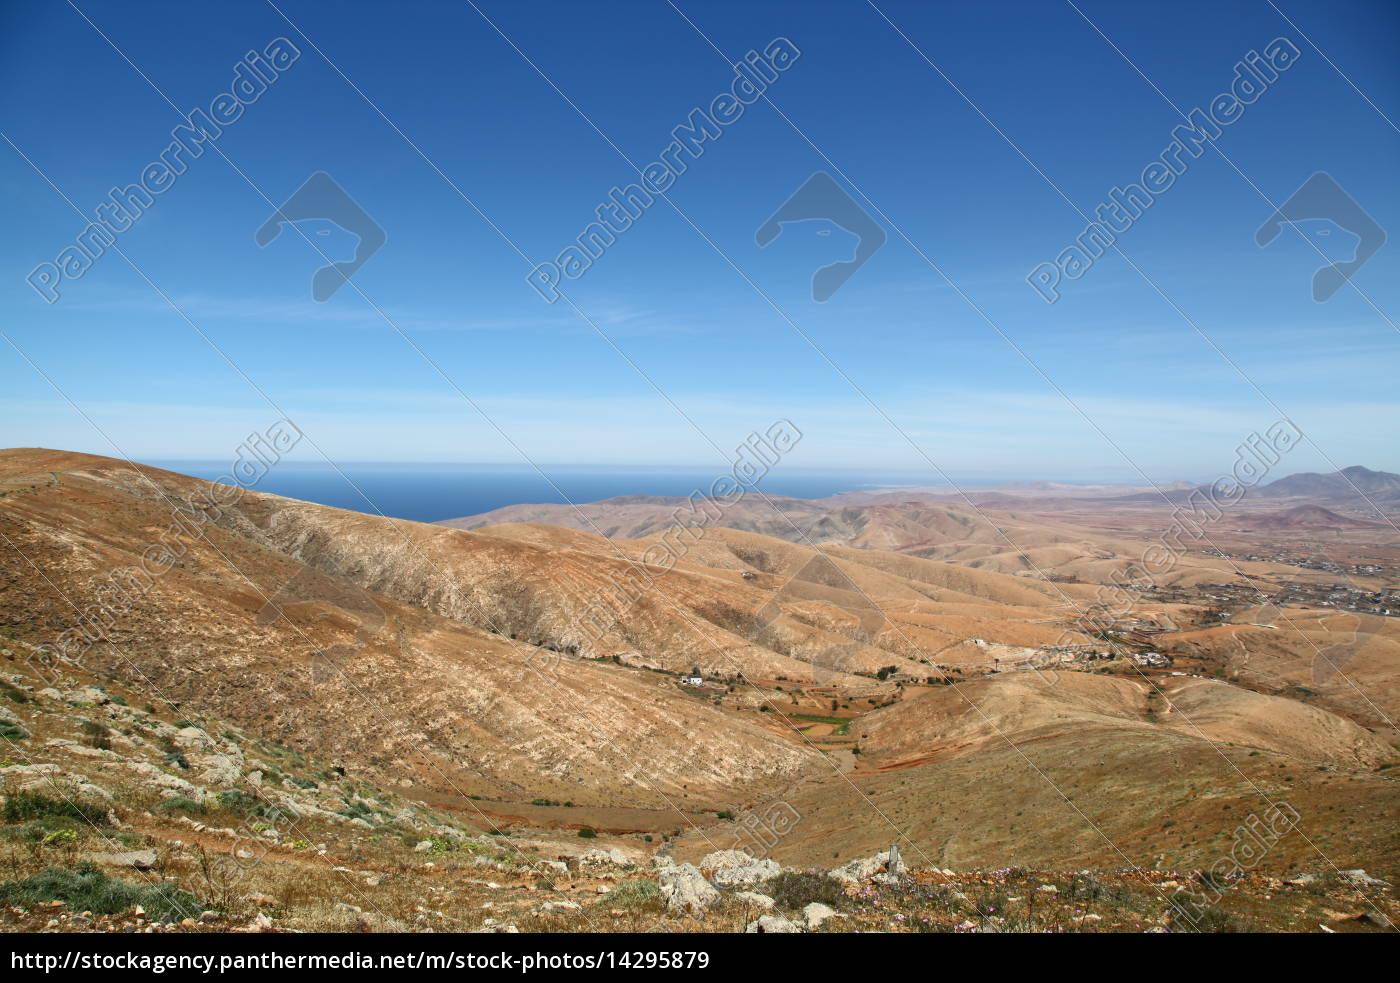 Fuerteventura, Kanarischen Inseln, Kanaren, Natur, Berge, Hügel - 14295879